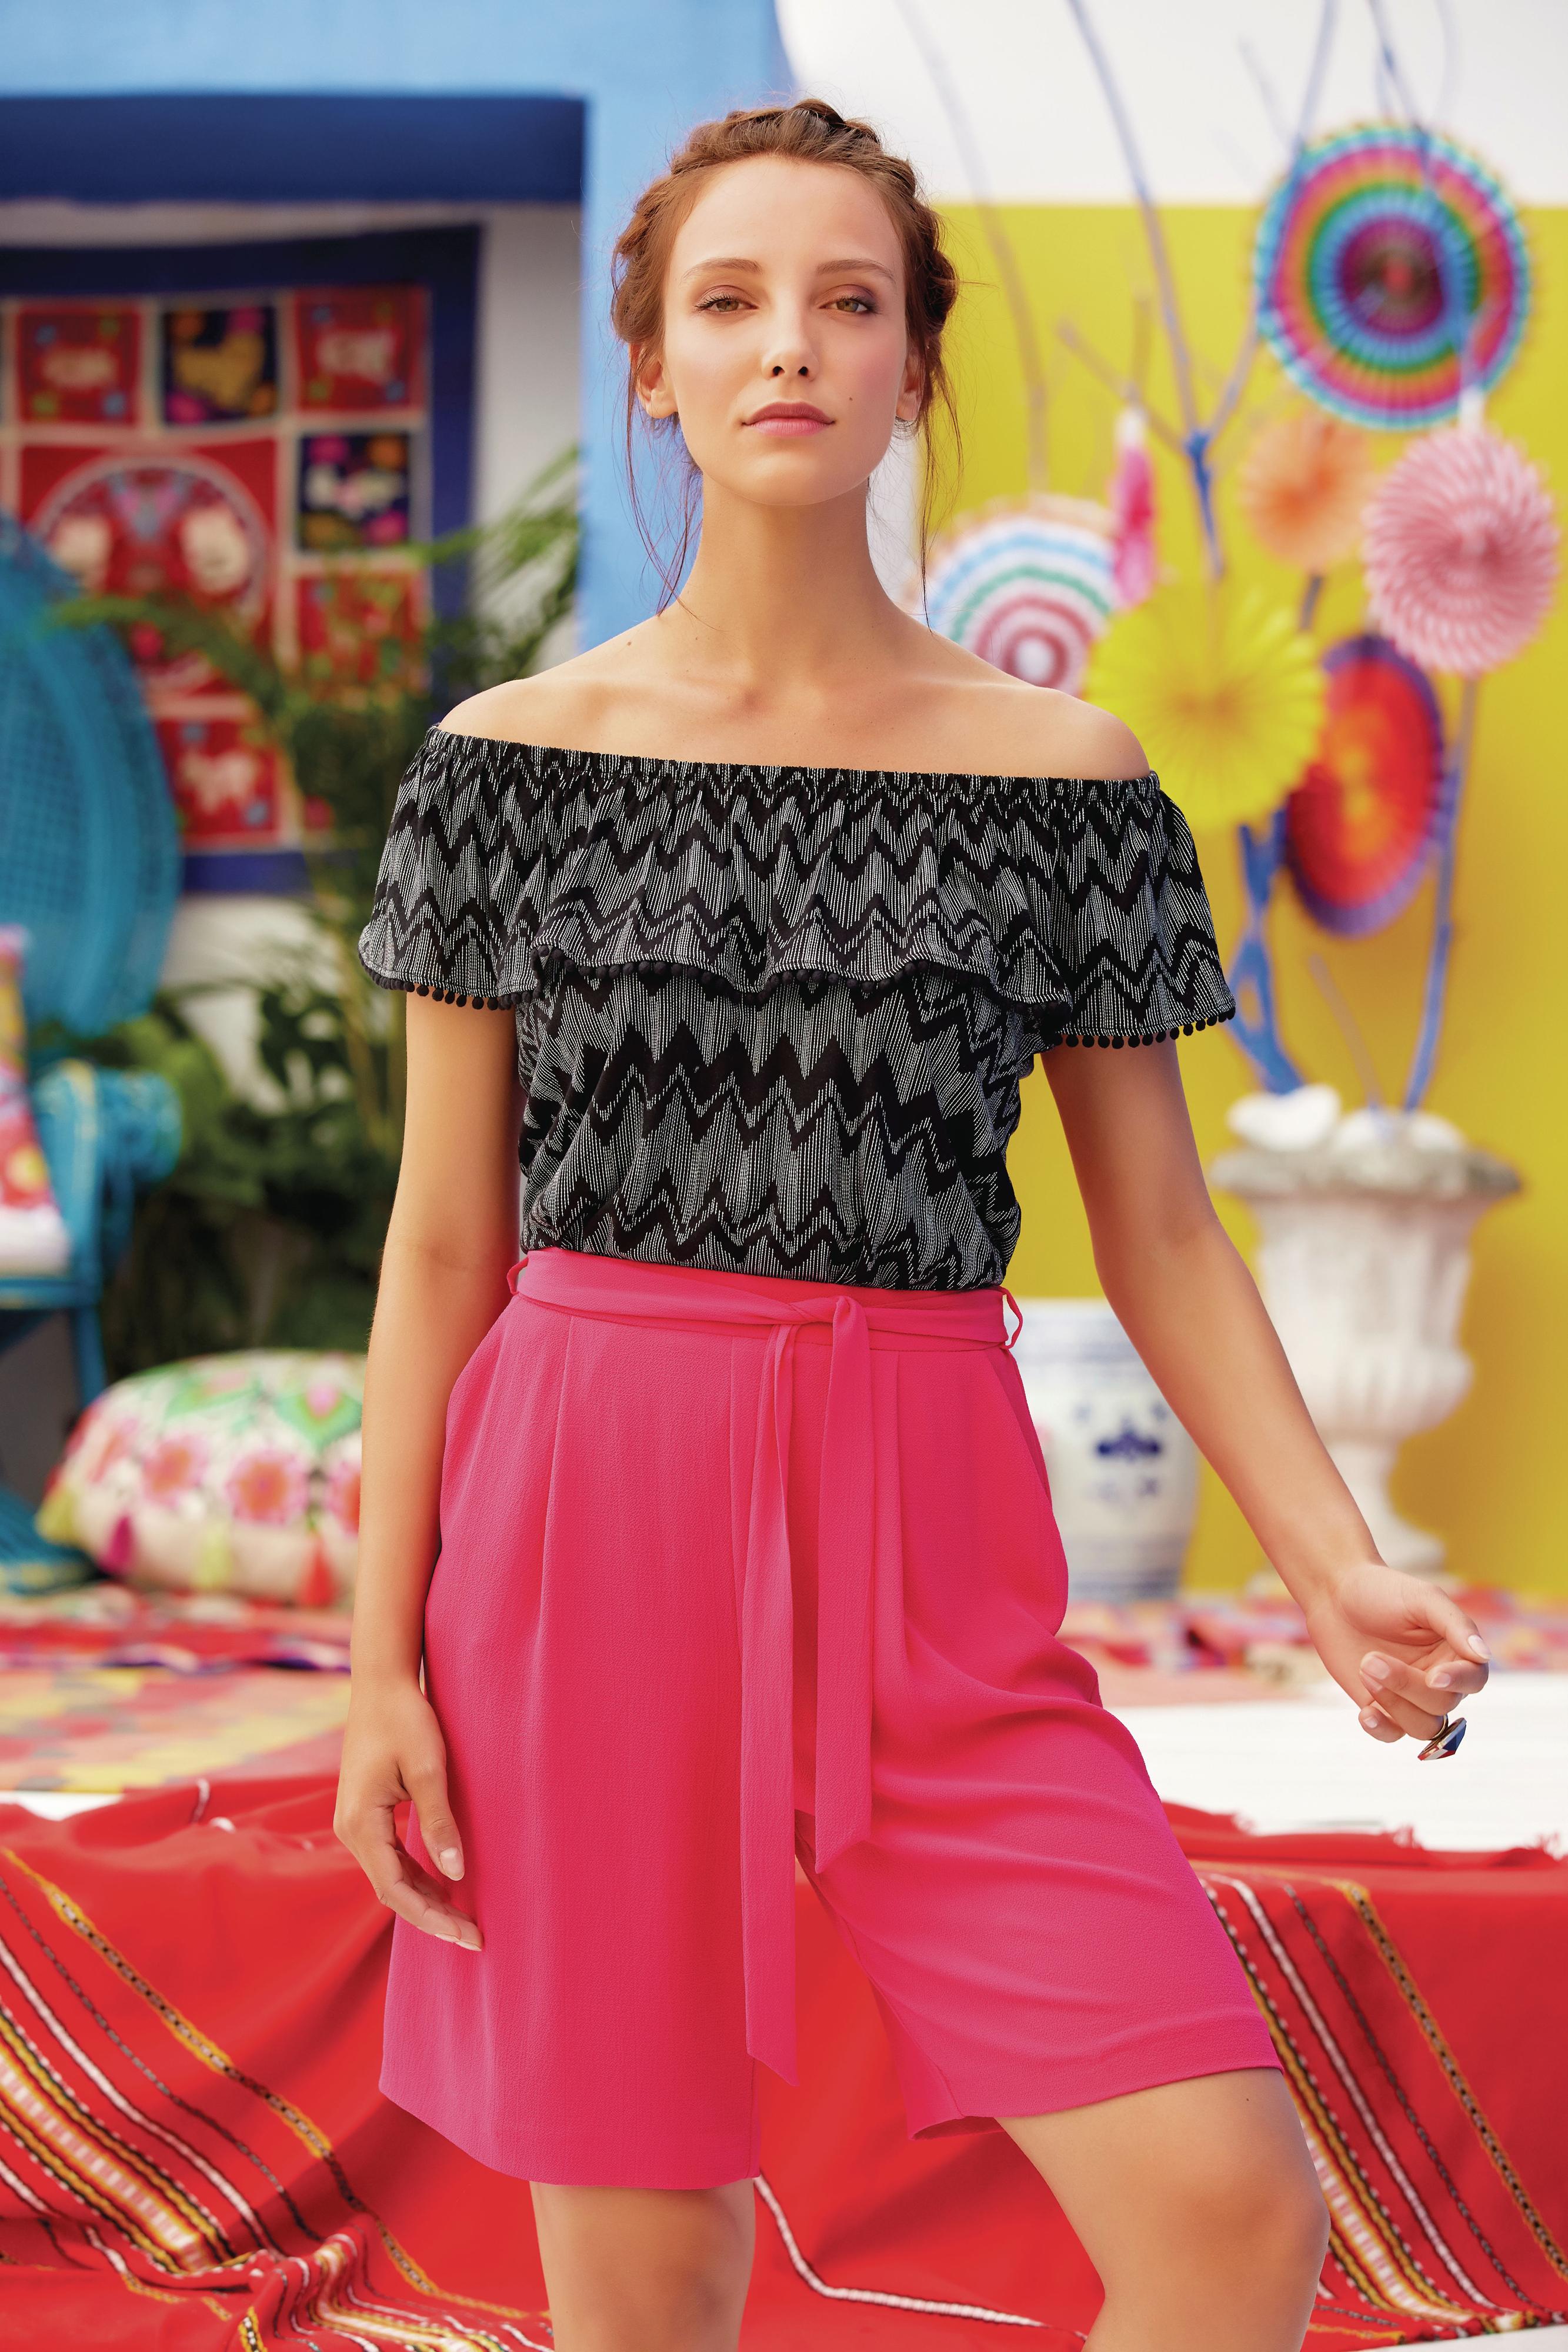 model wearing M&Co Chevron Print Frill Layer Bardot Top and Pink Tie Waist Shorts